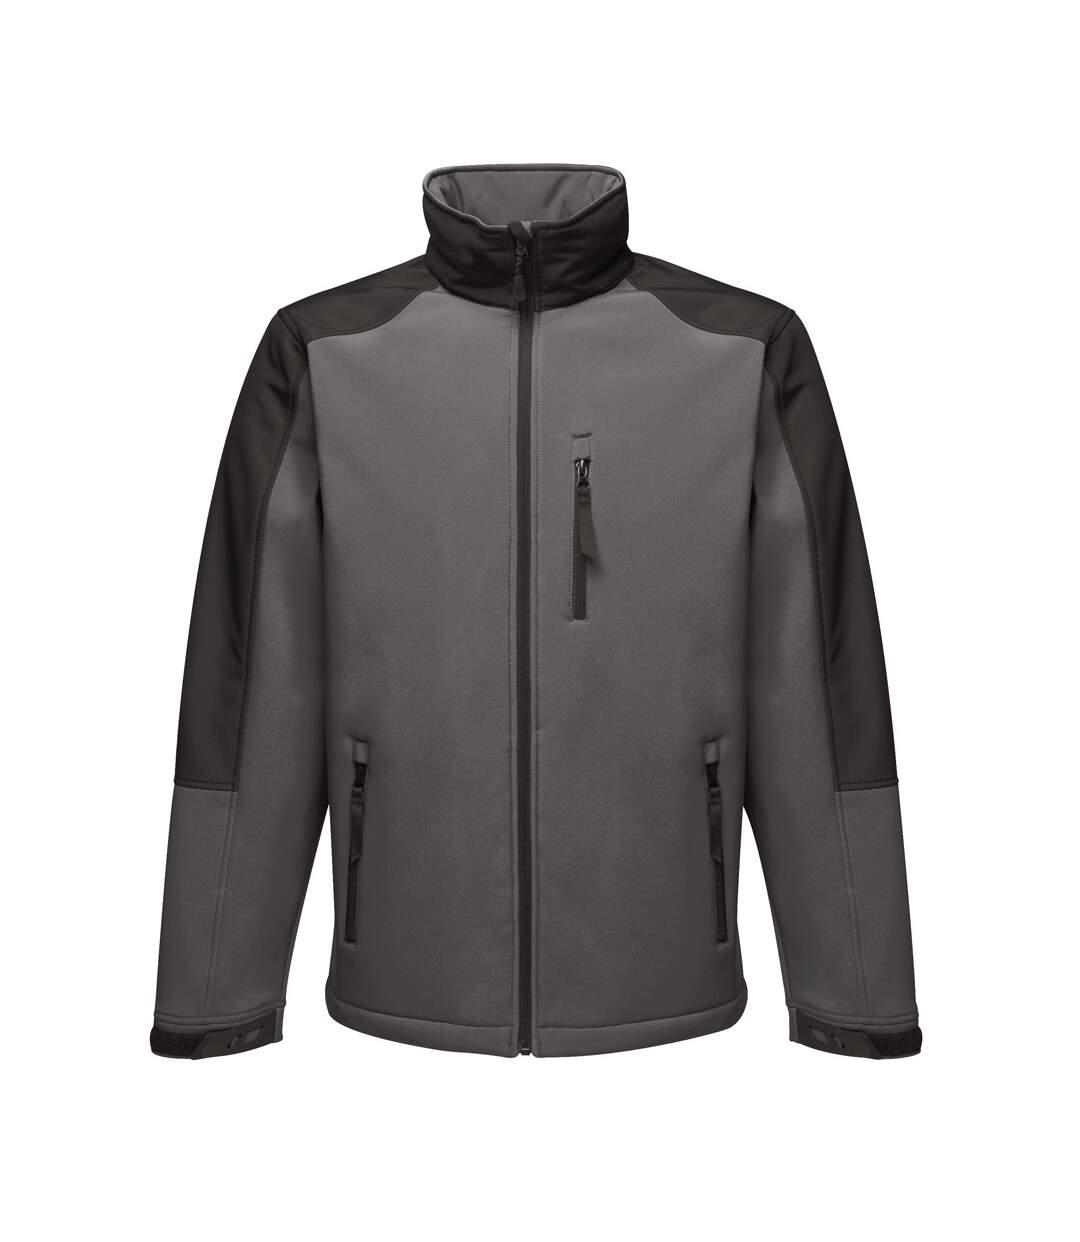 Regatta Mens Hydroforce 3-layer Membrane Waterproof Breathable Softshell Jackets (Oxford Blue) - UTRG1629